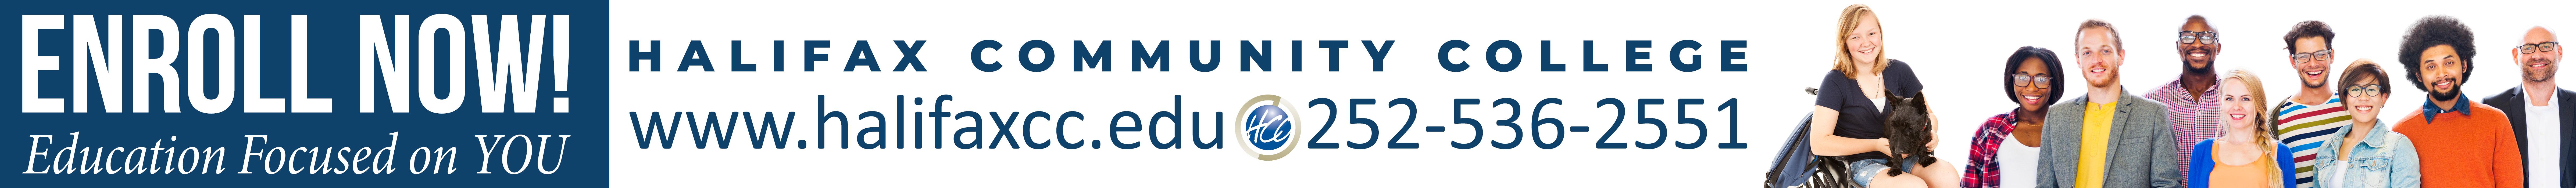 Halifax Community College HCC